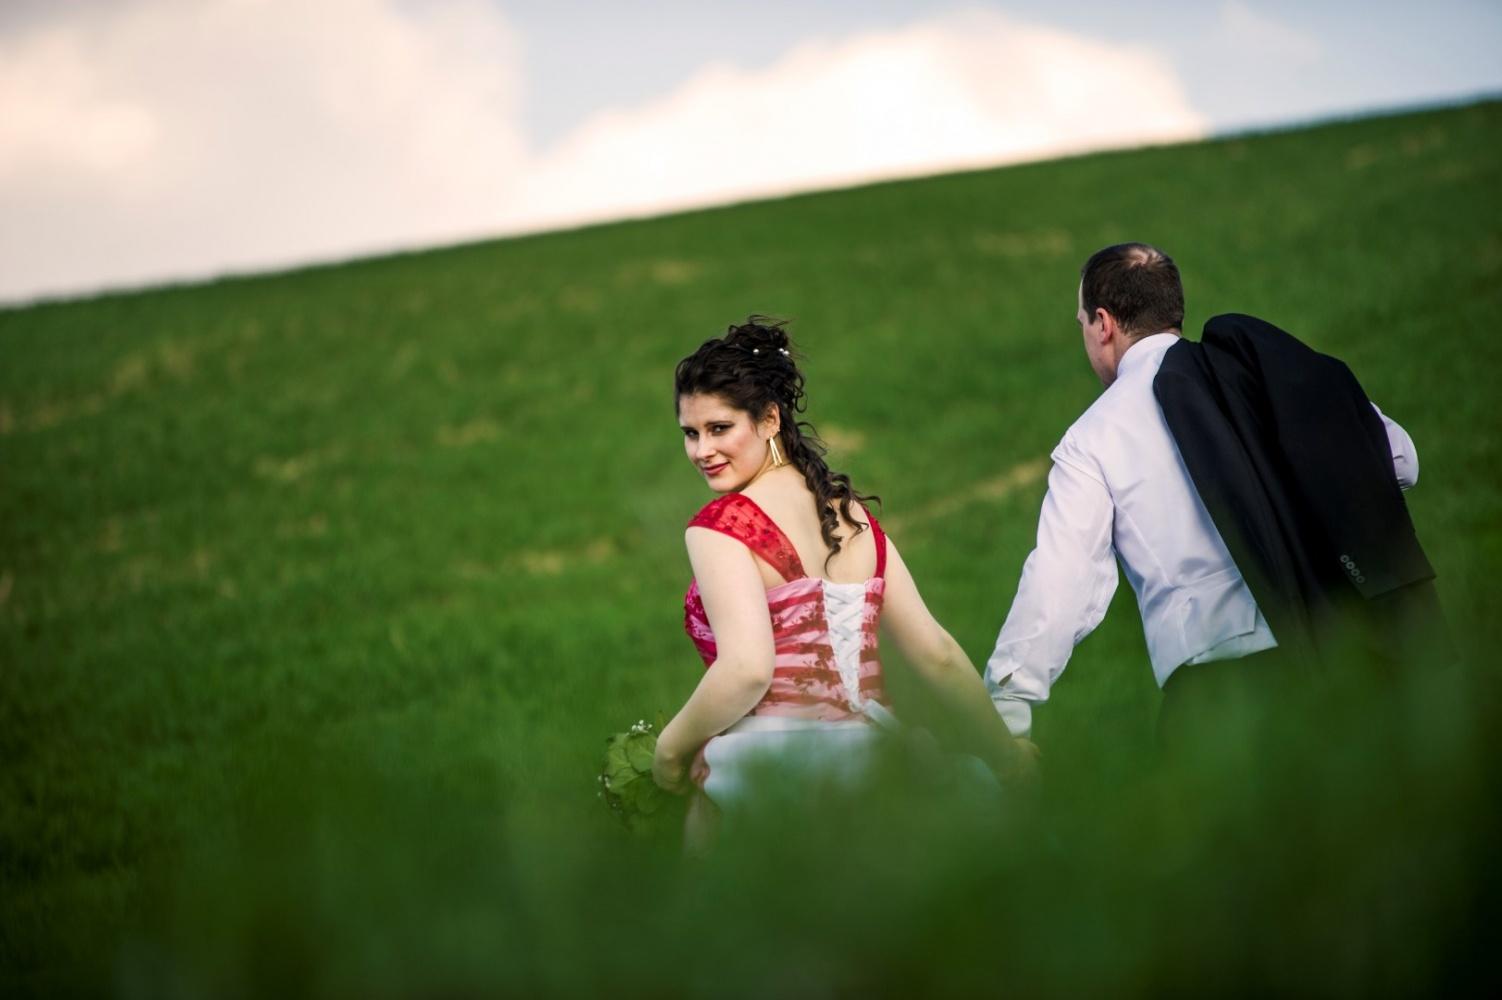 http://www.fotoz.sk/images/gallery-39/normal/svadobny-fotograf_eskuvoi-fotos_lacny-fotograf_fotograf-na-svadbu_juraj-zsok_fotograf-nitra_fotograf-galanta_juraj-zsok238.jpg